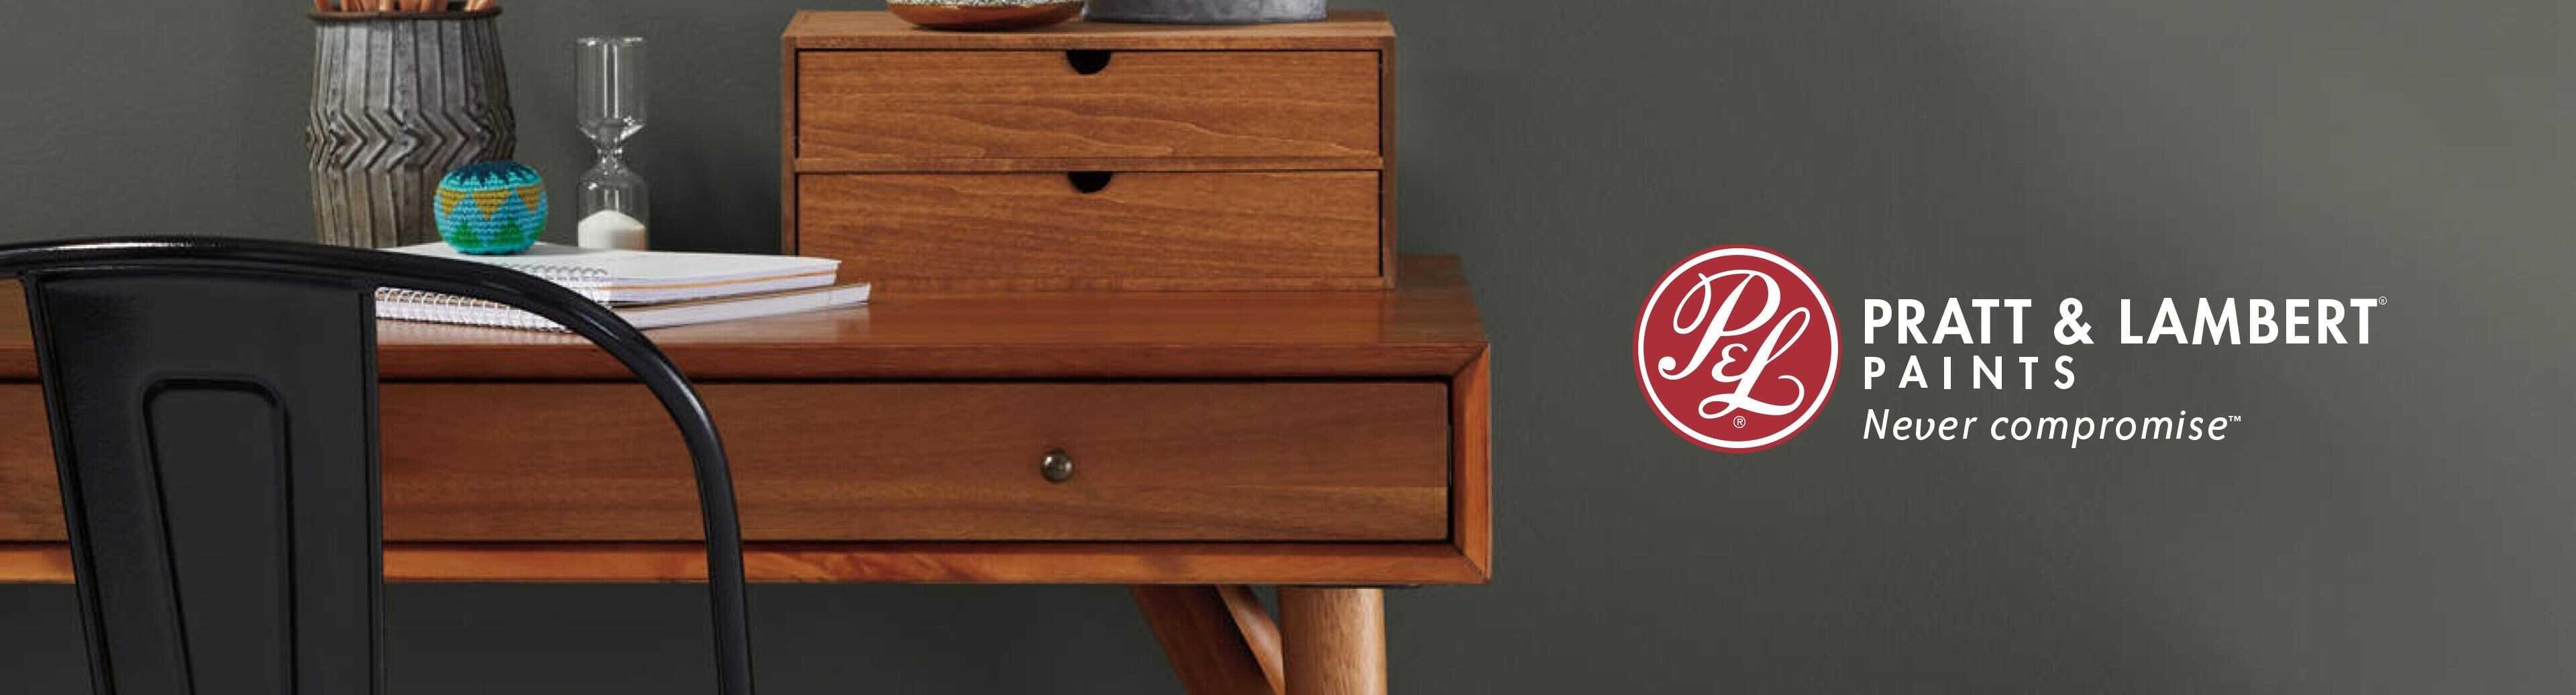 Wooden desk with painted wall and Pratt & Lambert logo